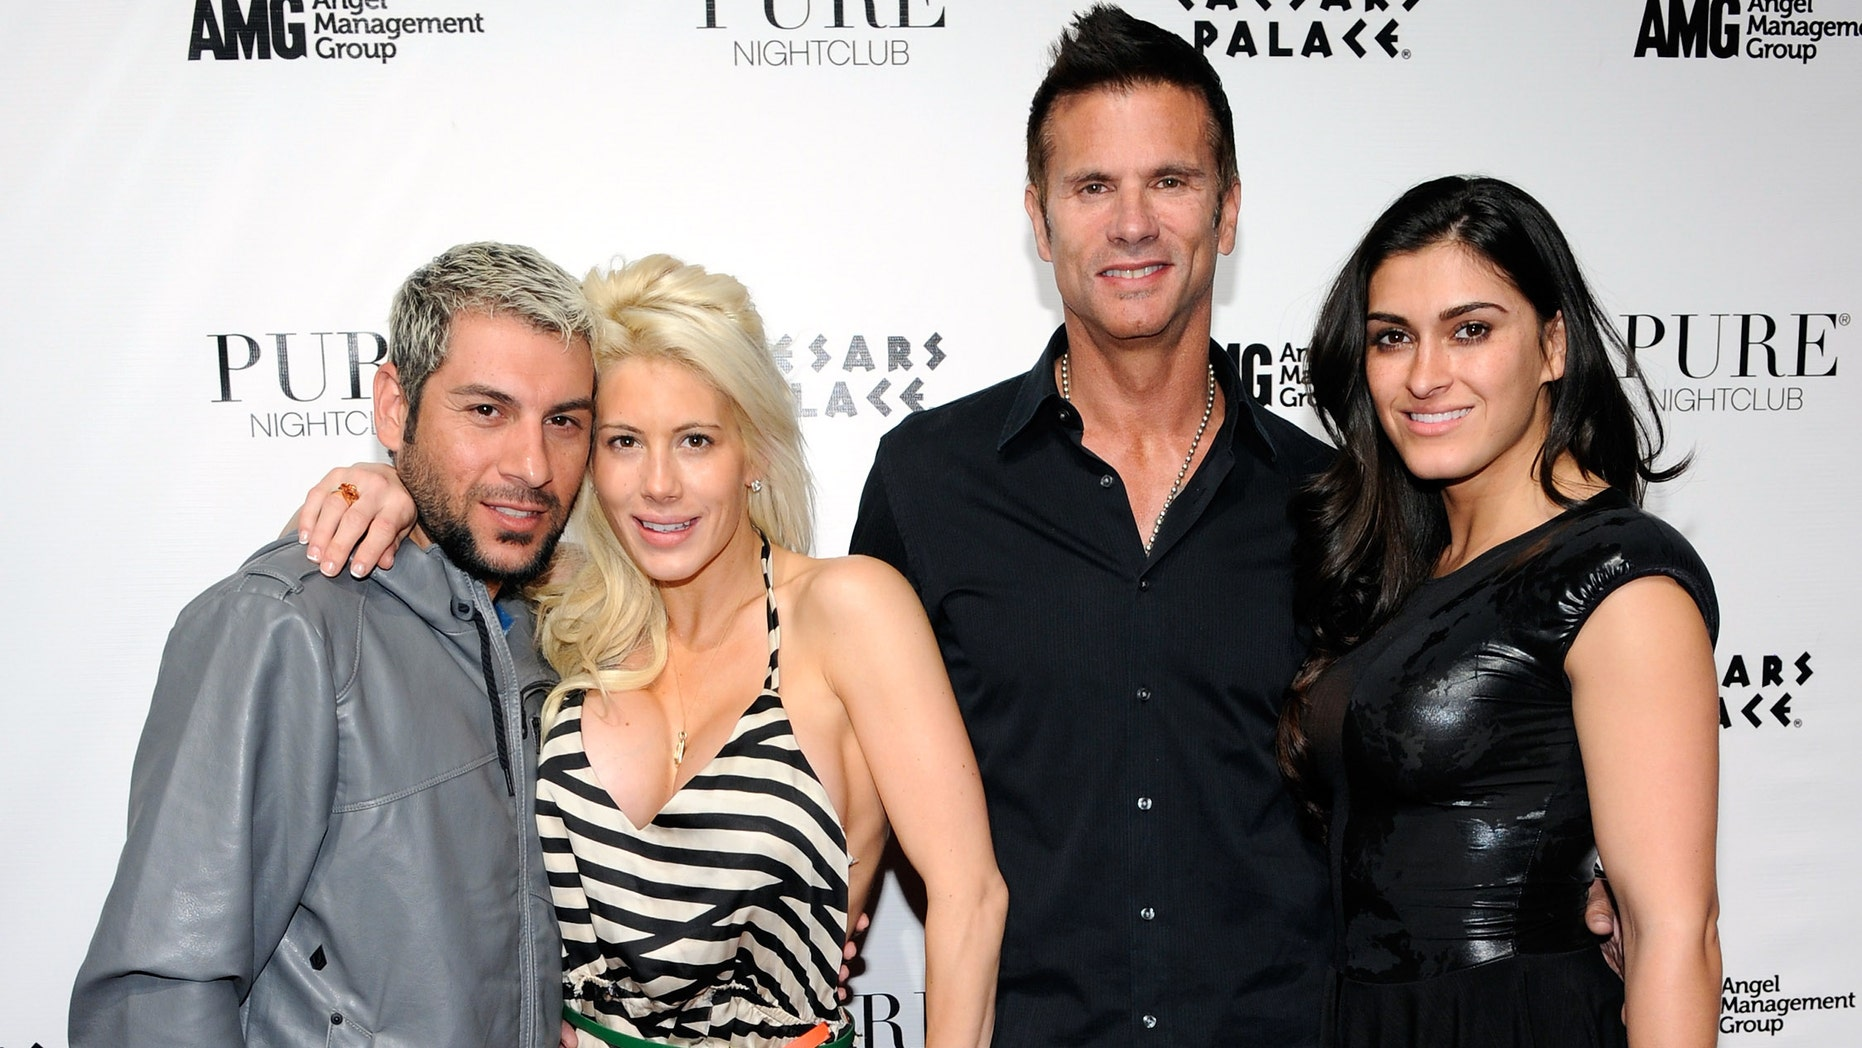 Blogger Nik Richie, his wife, actress Shayne Lamas, her father, actor Lorenzo Lamas and his wife Shawna Craig.